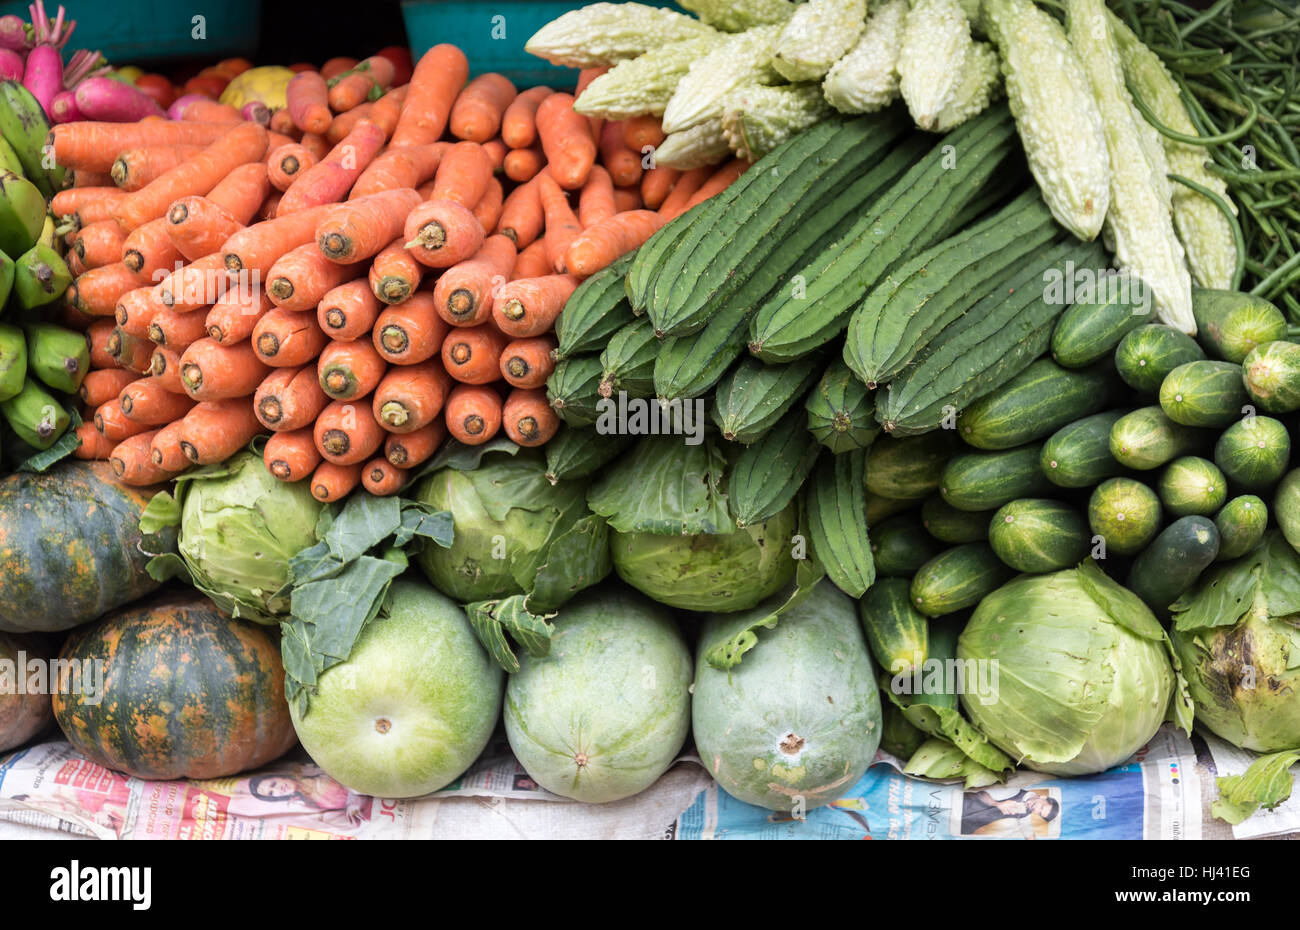 Fresh vegetables arranged at Fort Kochin market, Cochin ...Kerala Vegetable Market